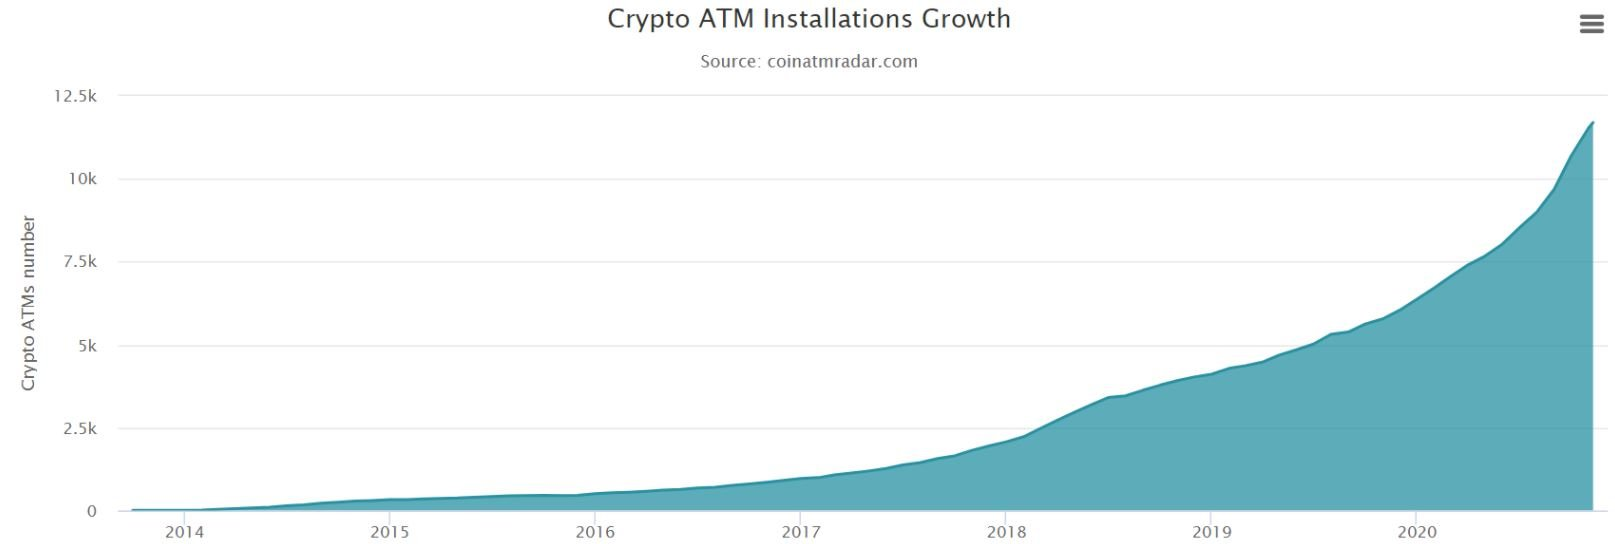 crypto atm installations 11092020